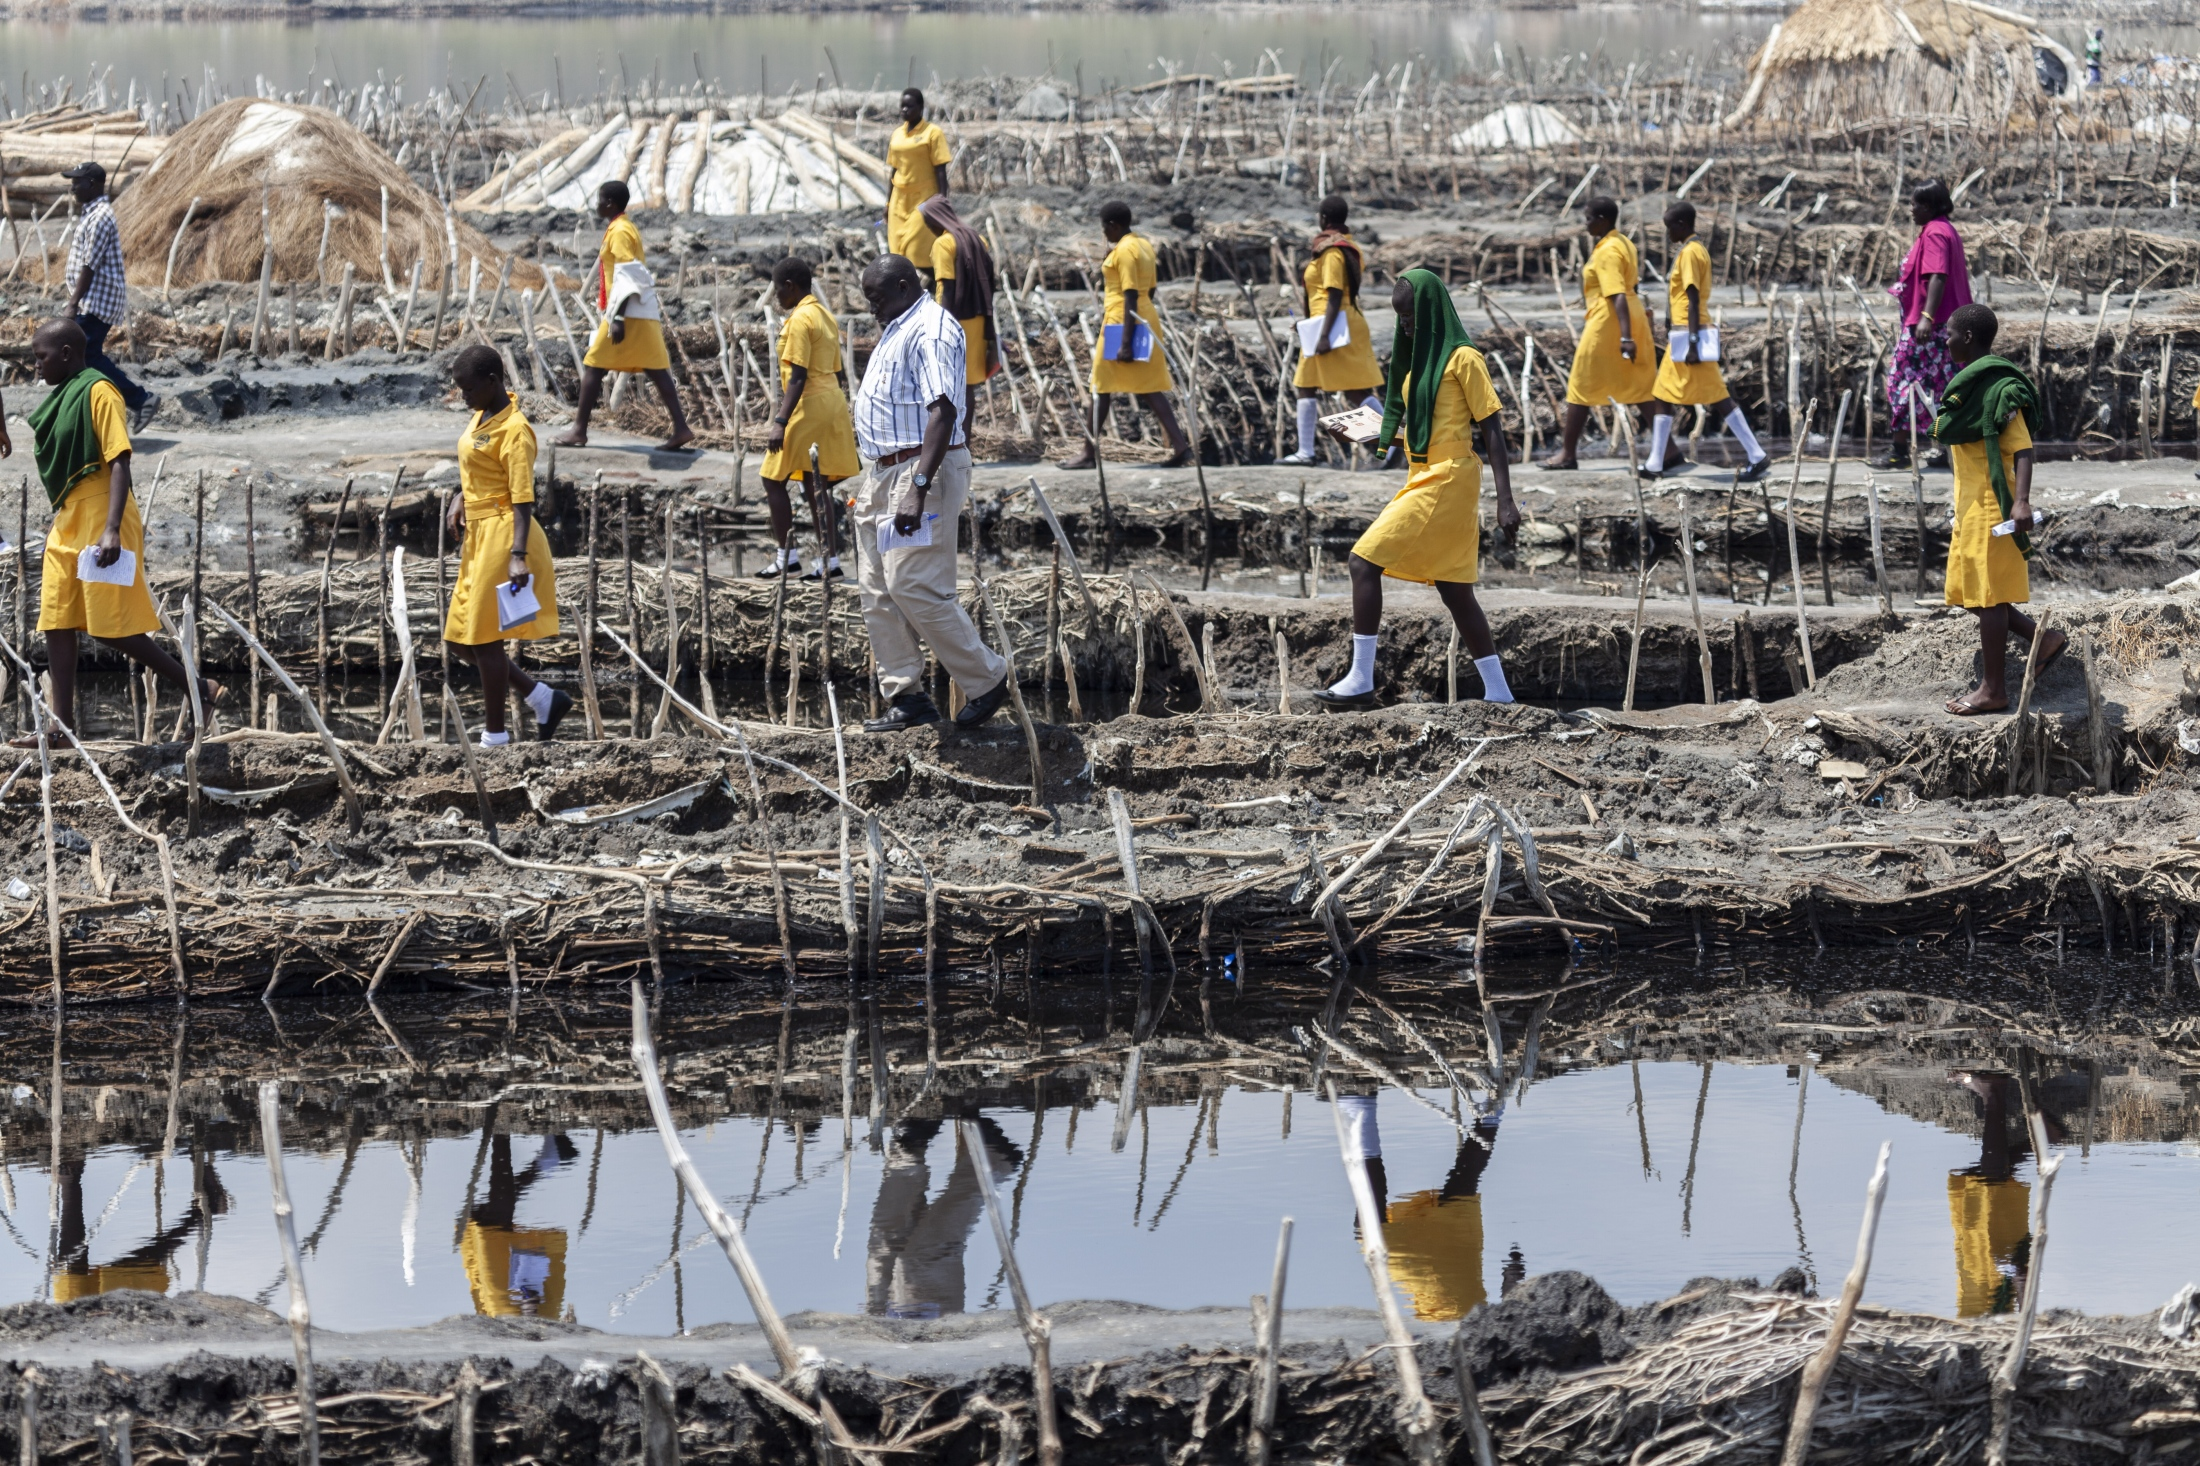 Photography image - Students visiting the salt mines at Lake Katwe in Uganda.